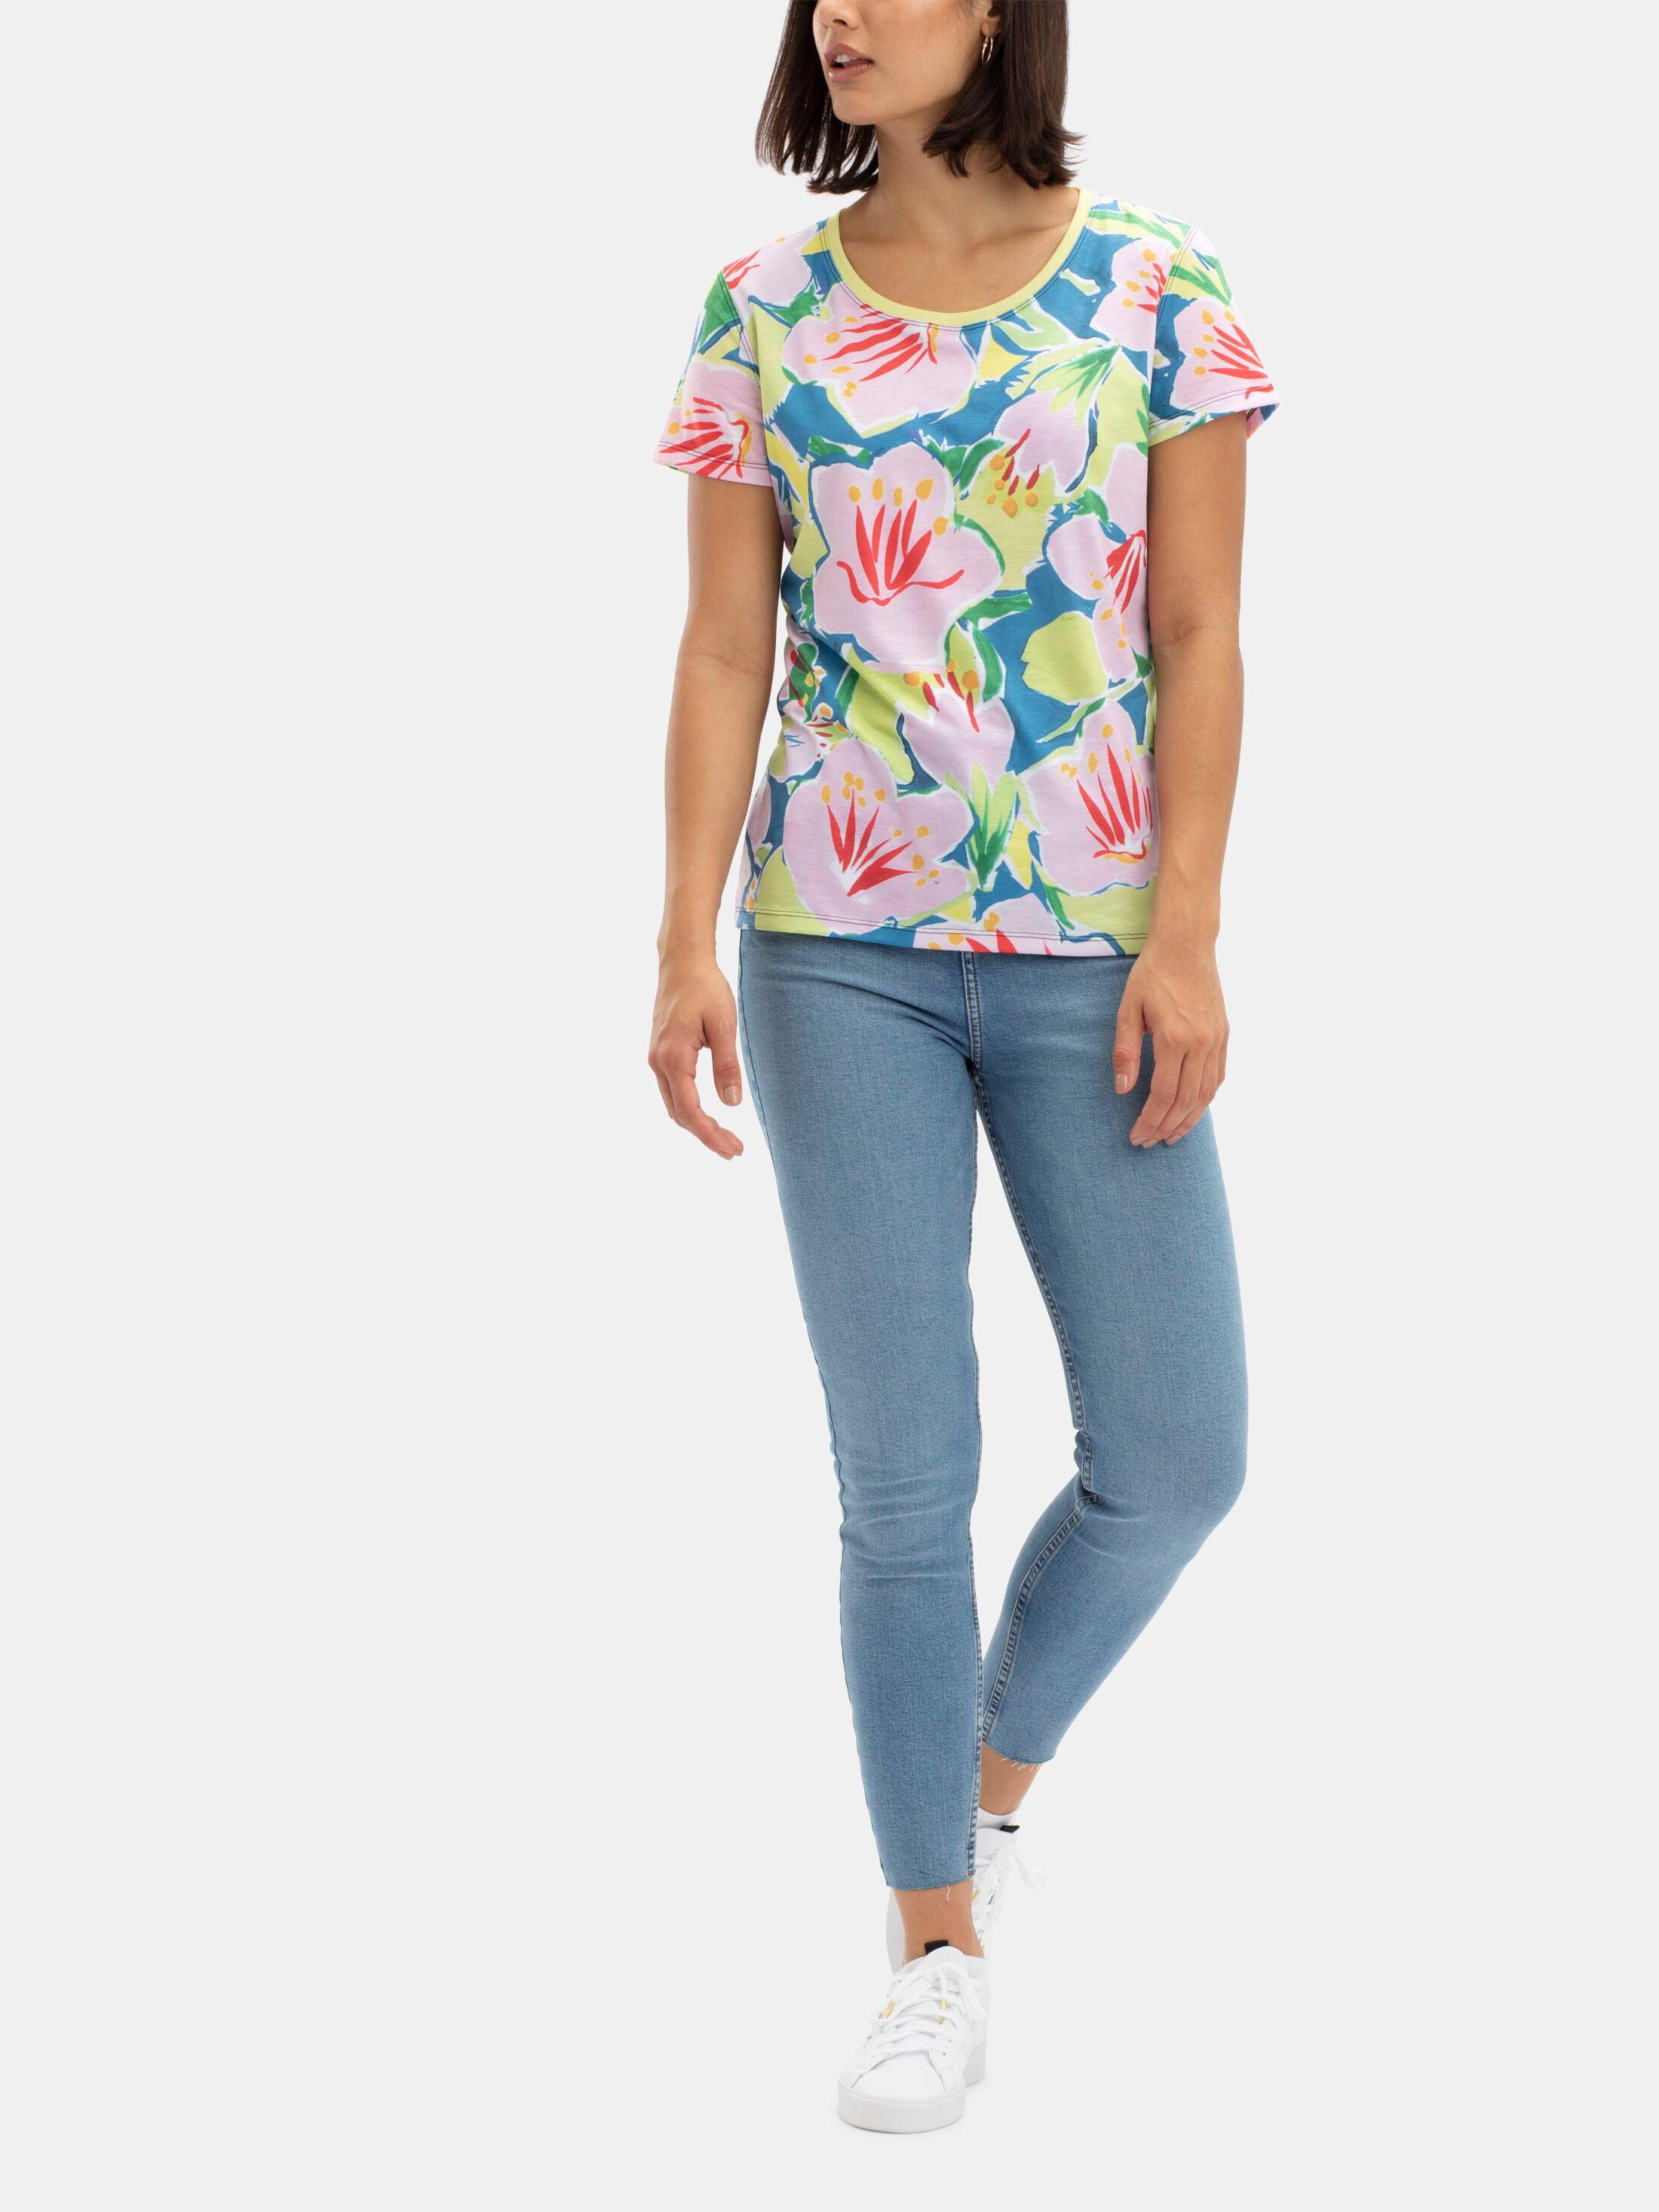 Women's Basic Custom Cotton T-Shirt